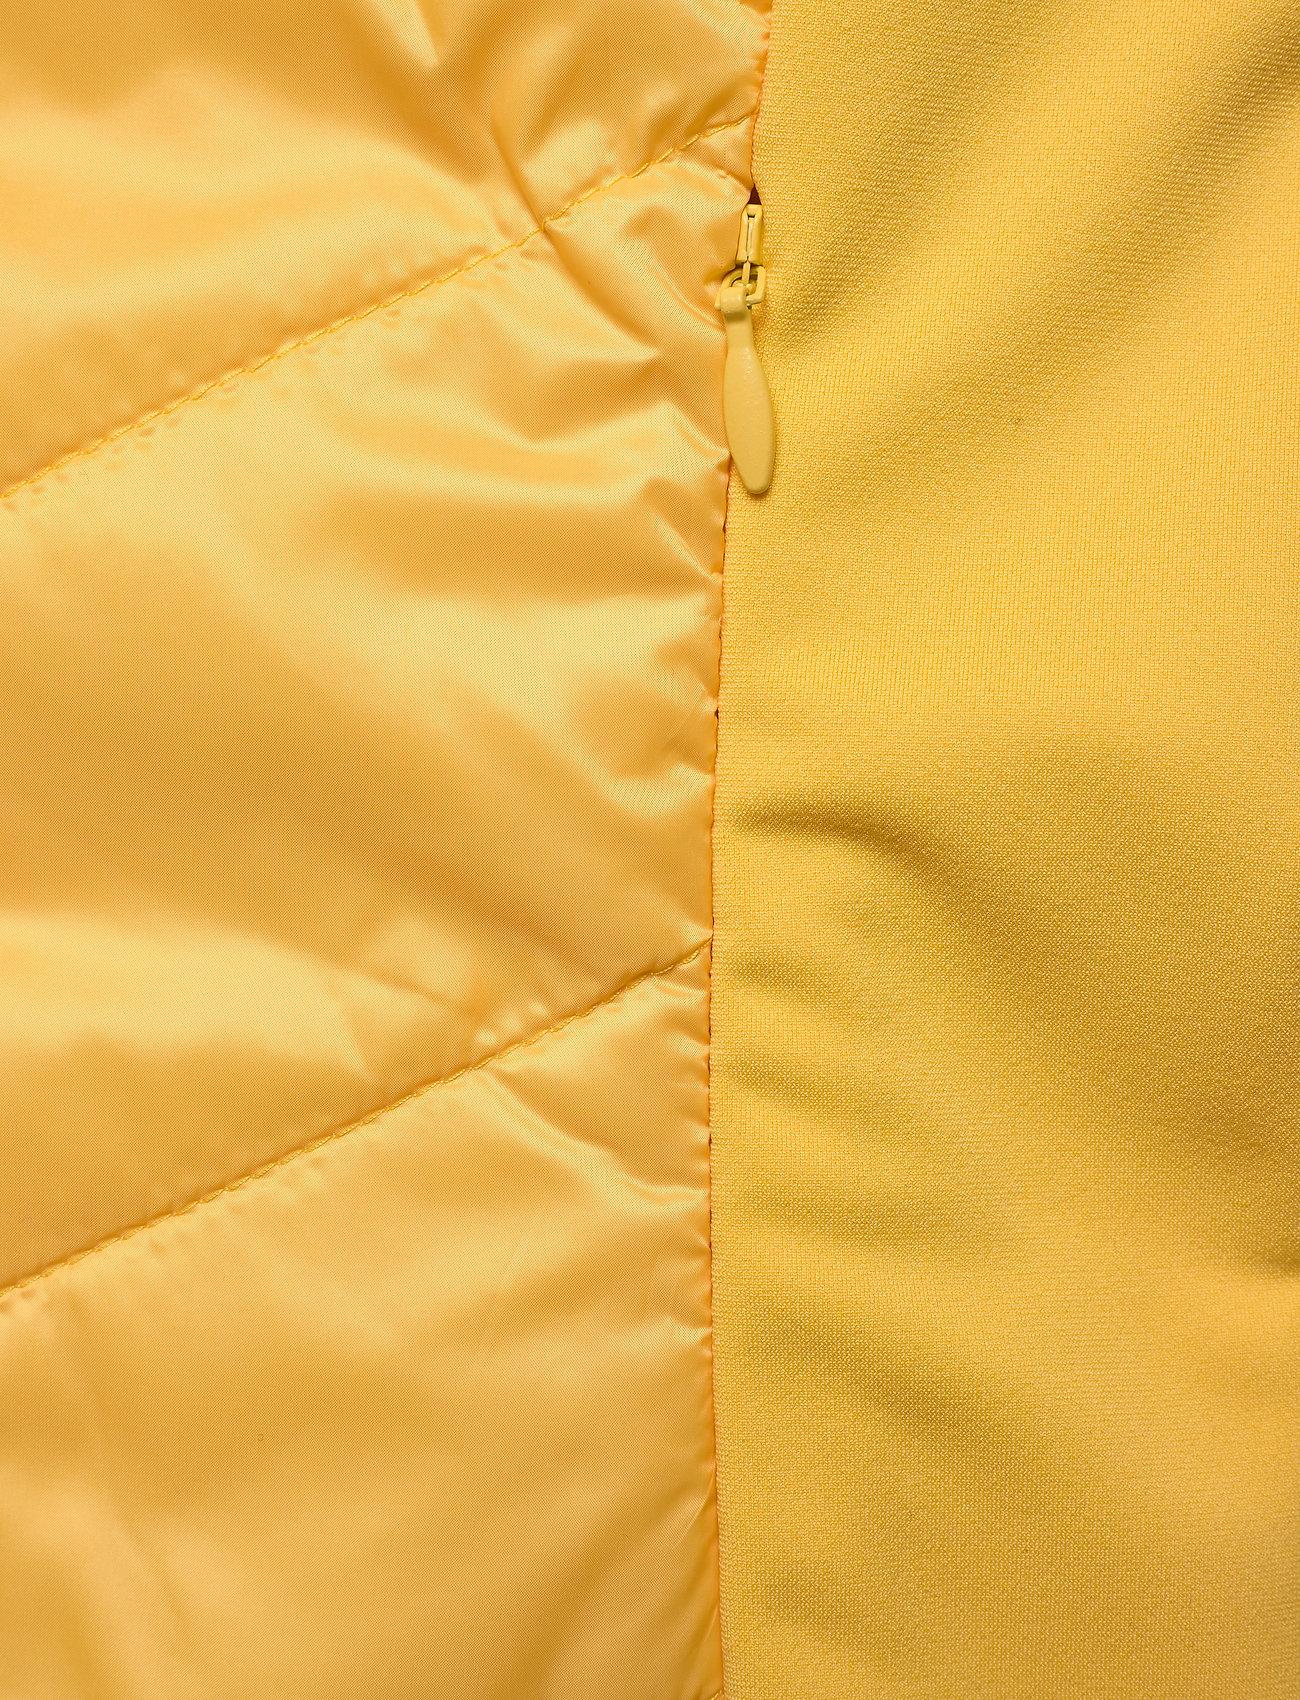 Kari Traa EVA VEST - Jackets & Coats SHINE